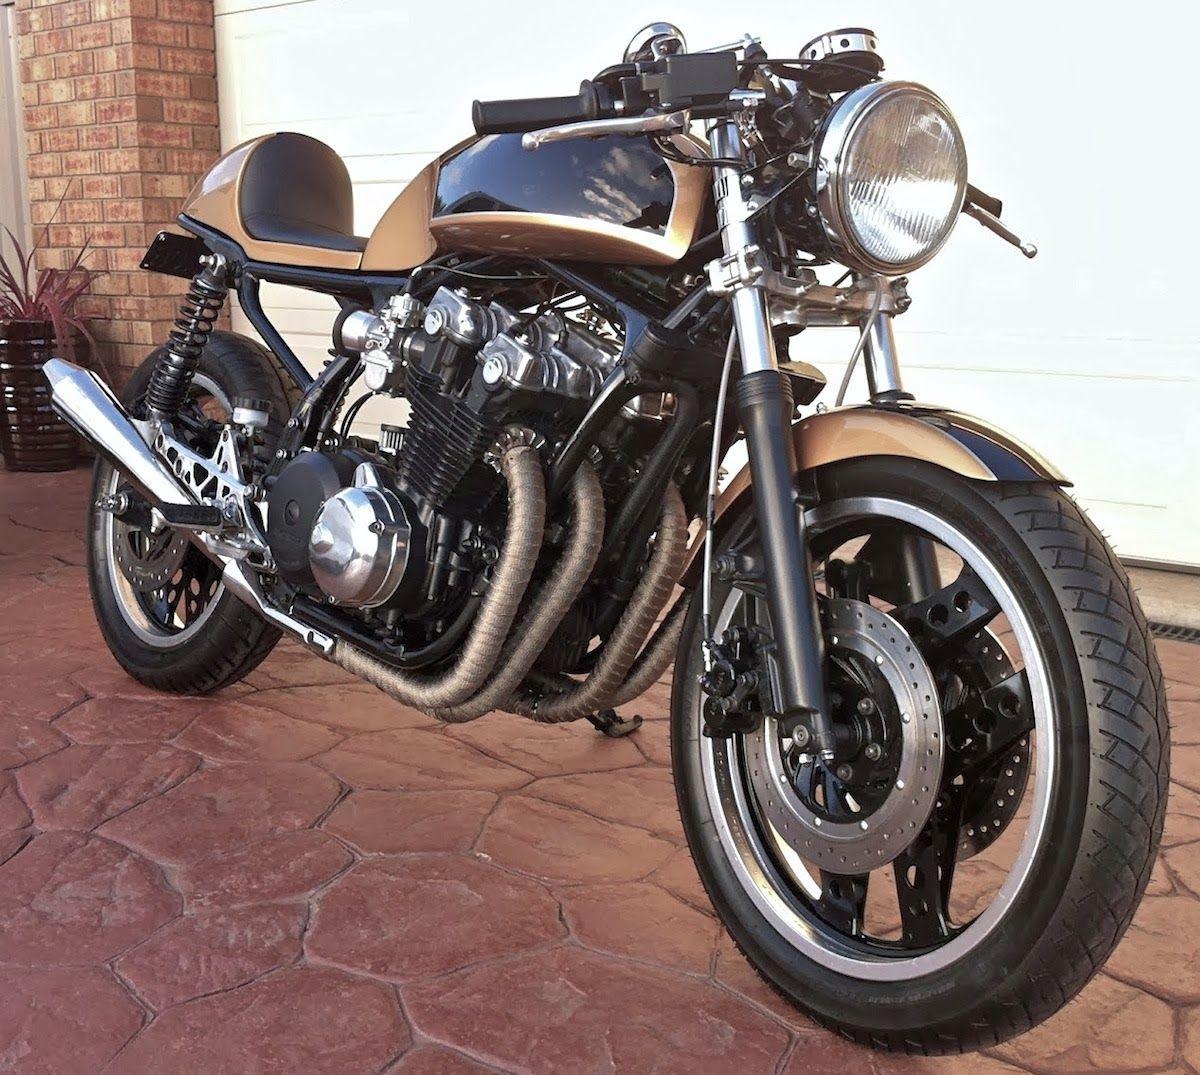 honda cb900f bol d'or cafe racer | honda motorcycles | pinterest